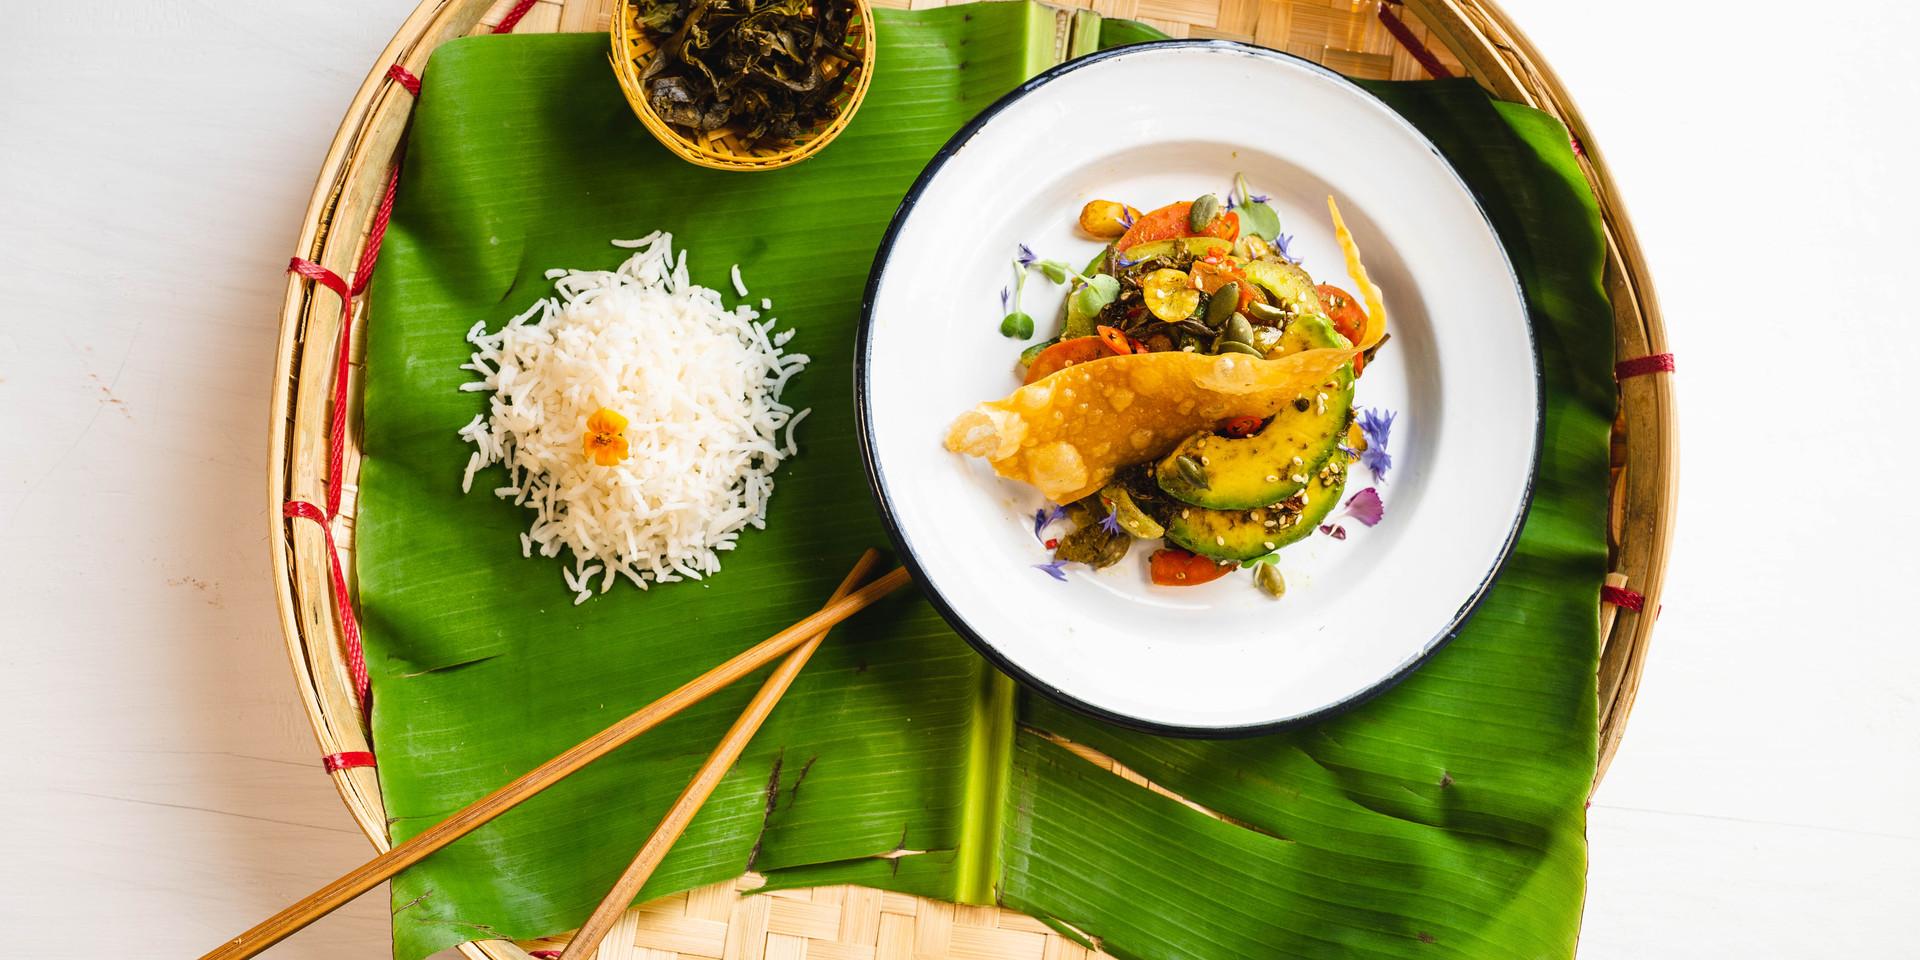 Authentic Burmese food by Burma Burma